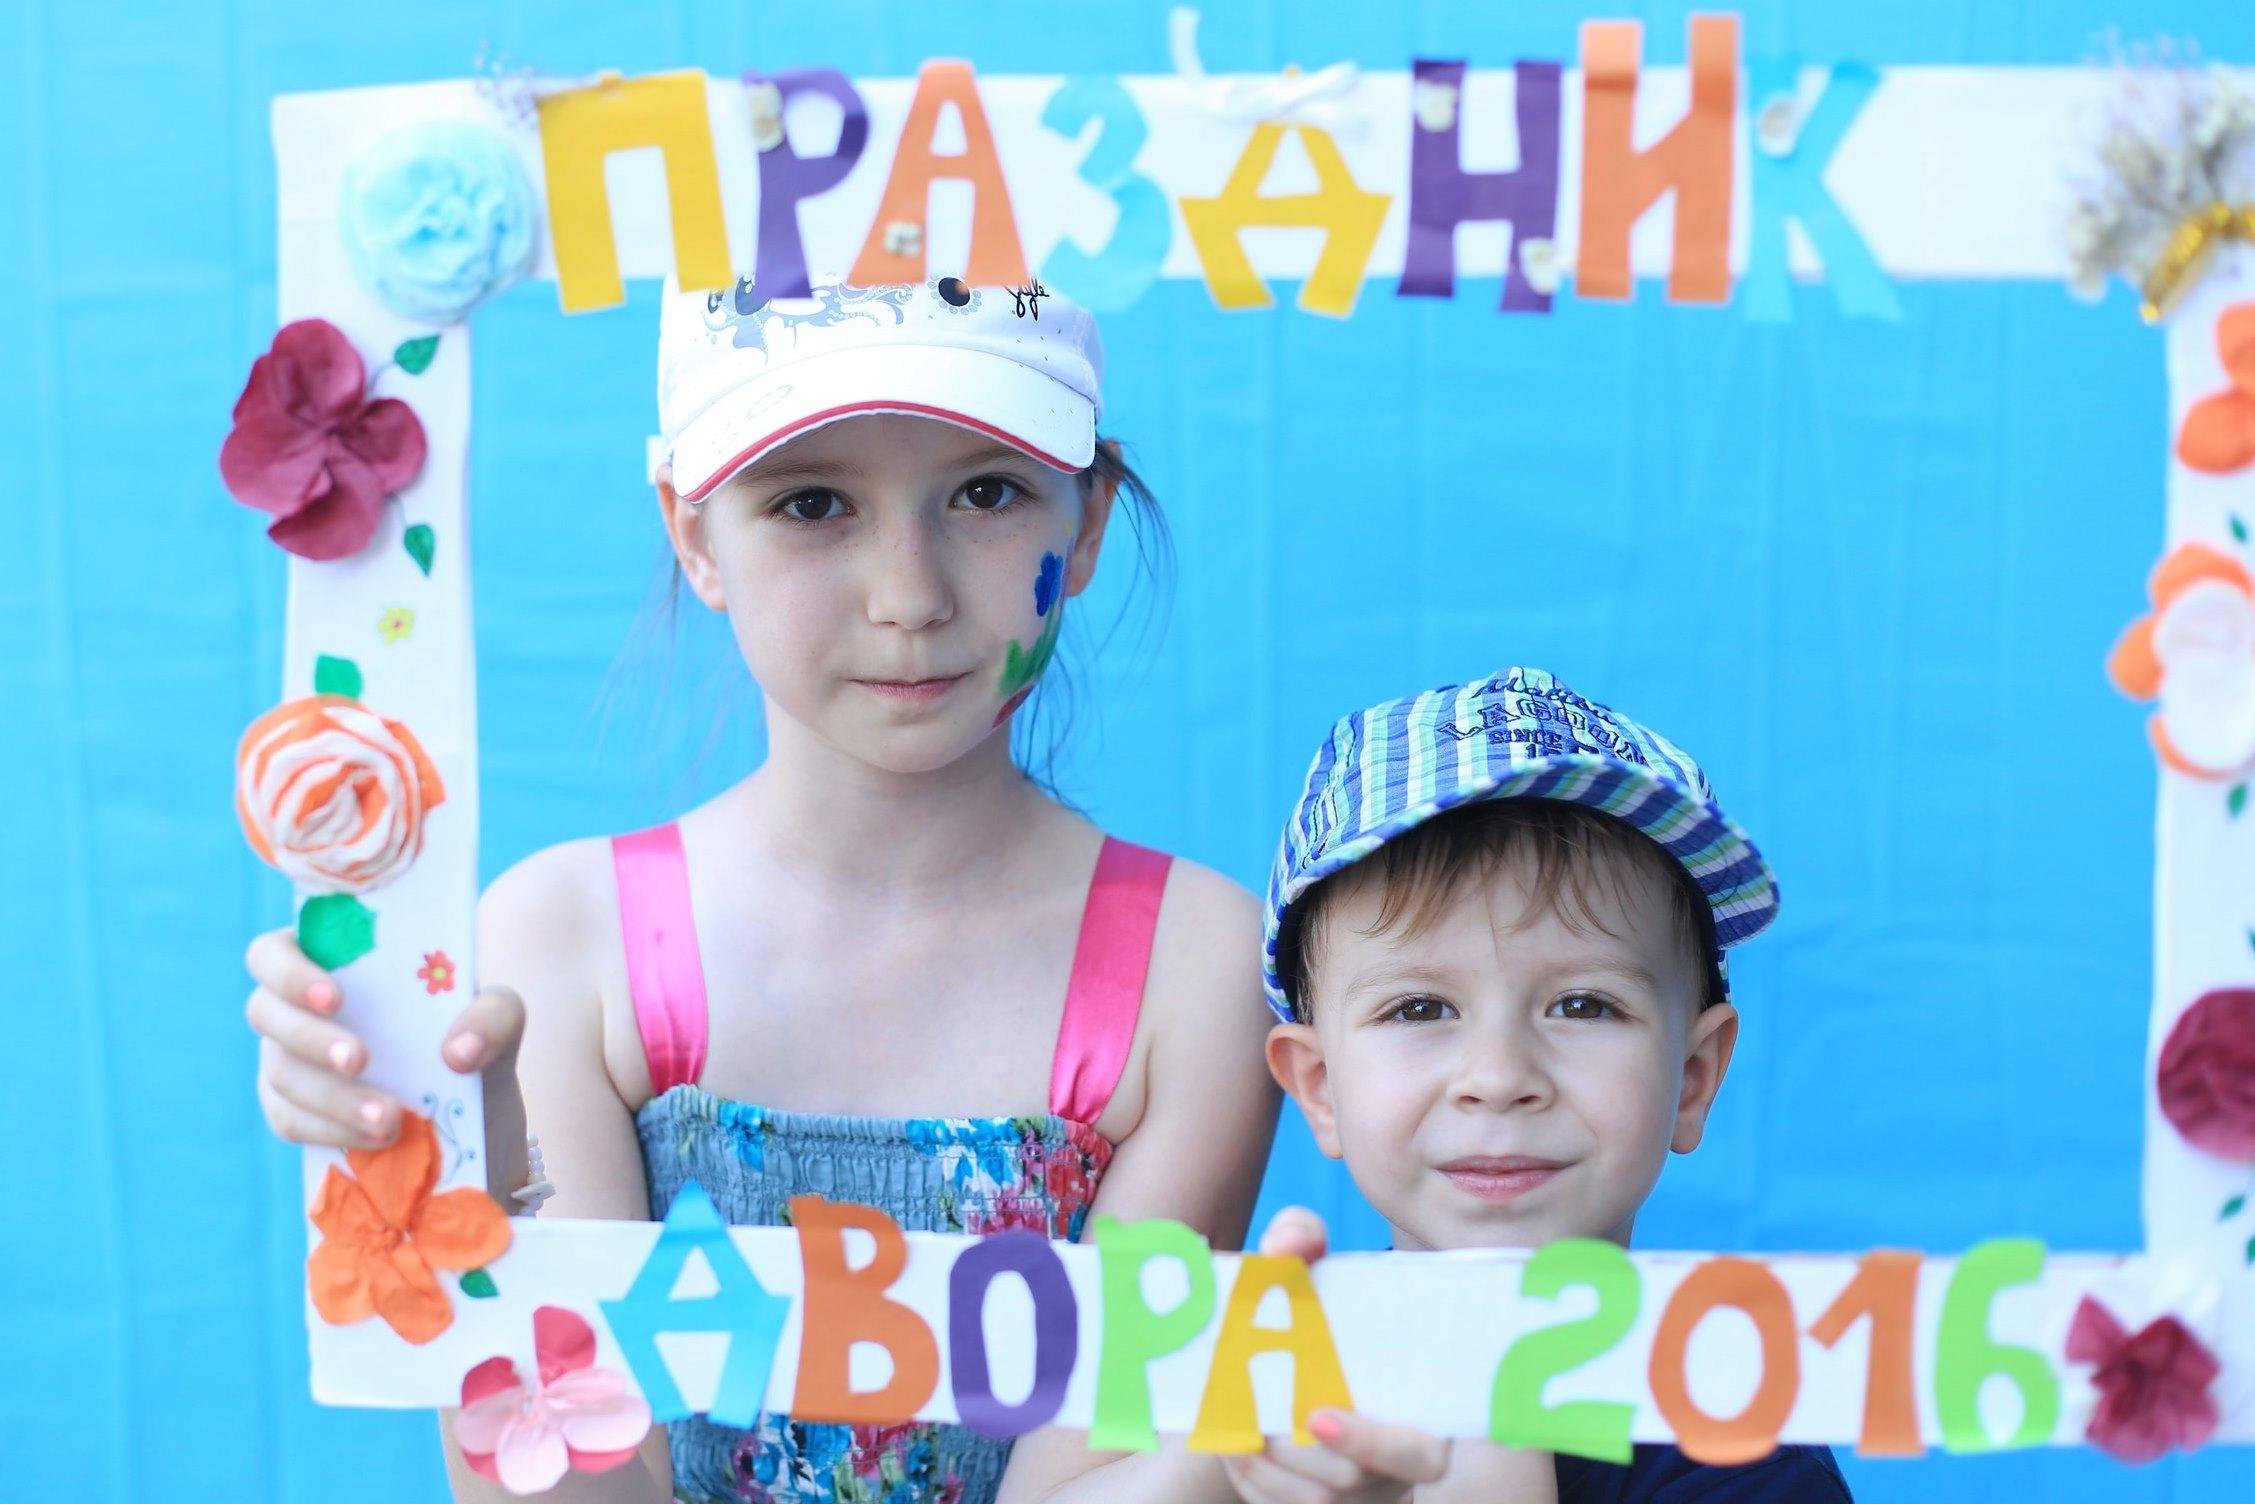 25.06.2016, праздник двора, 42